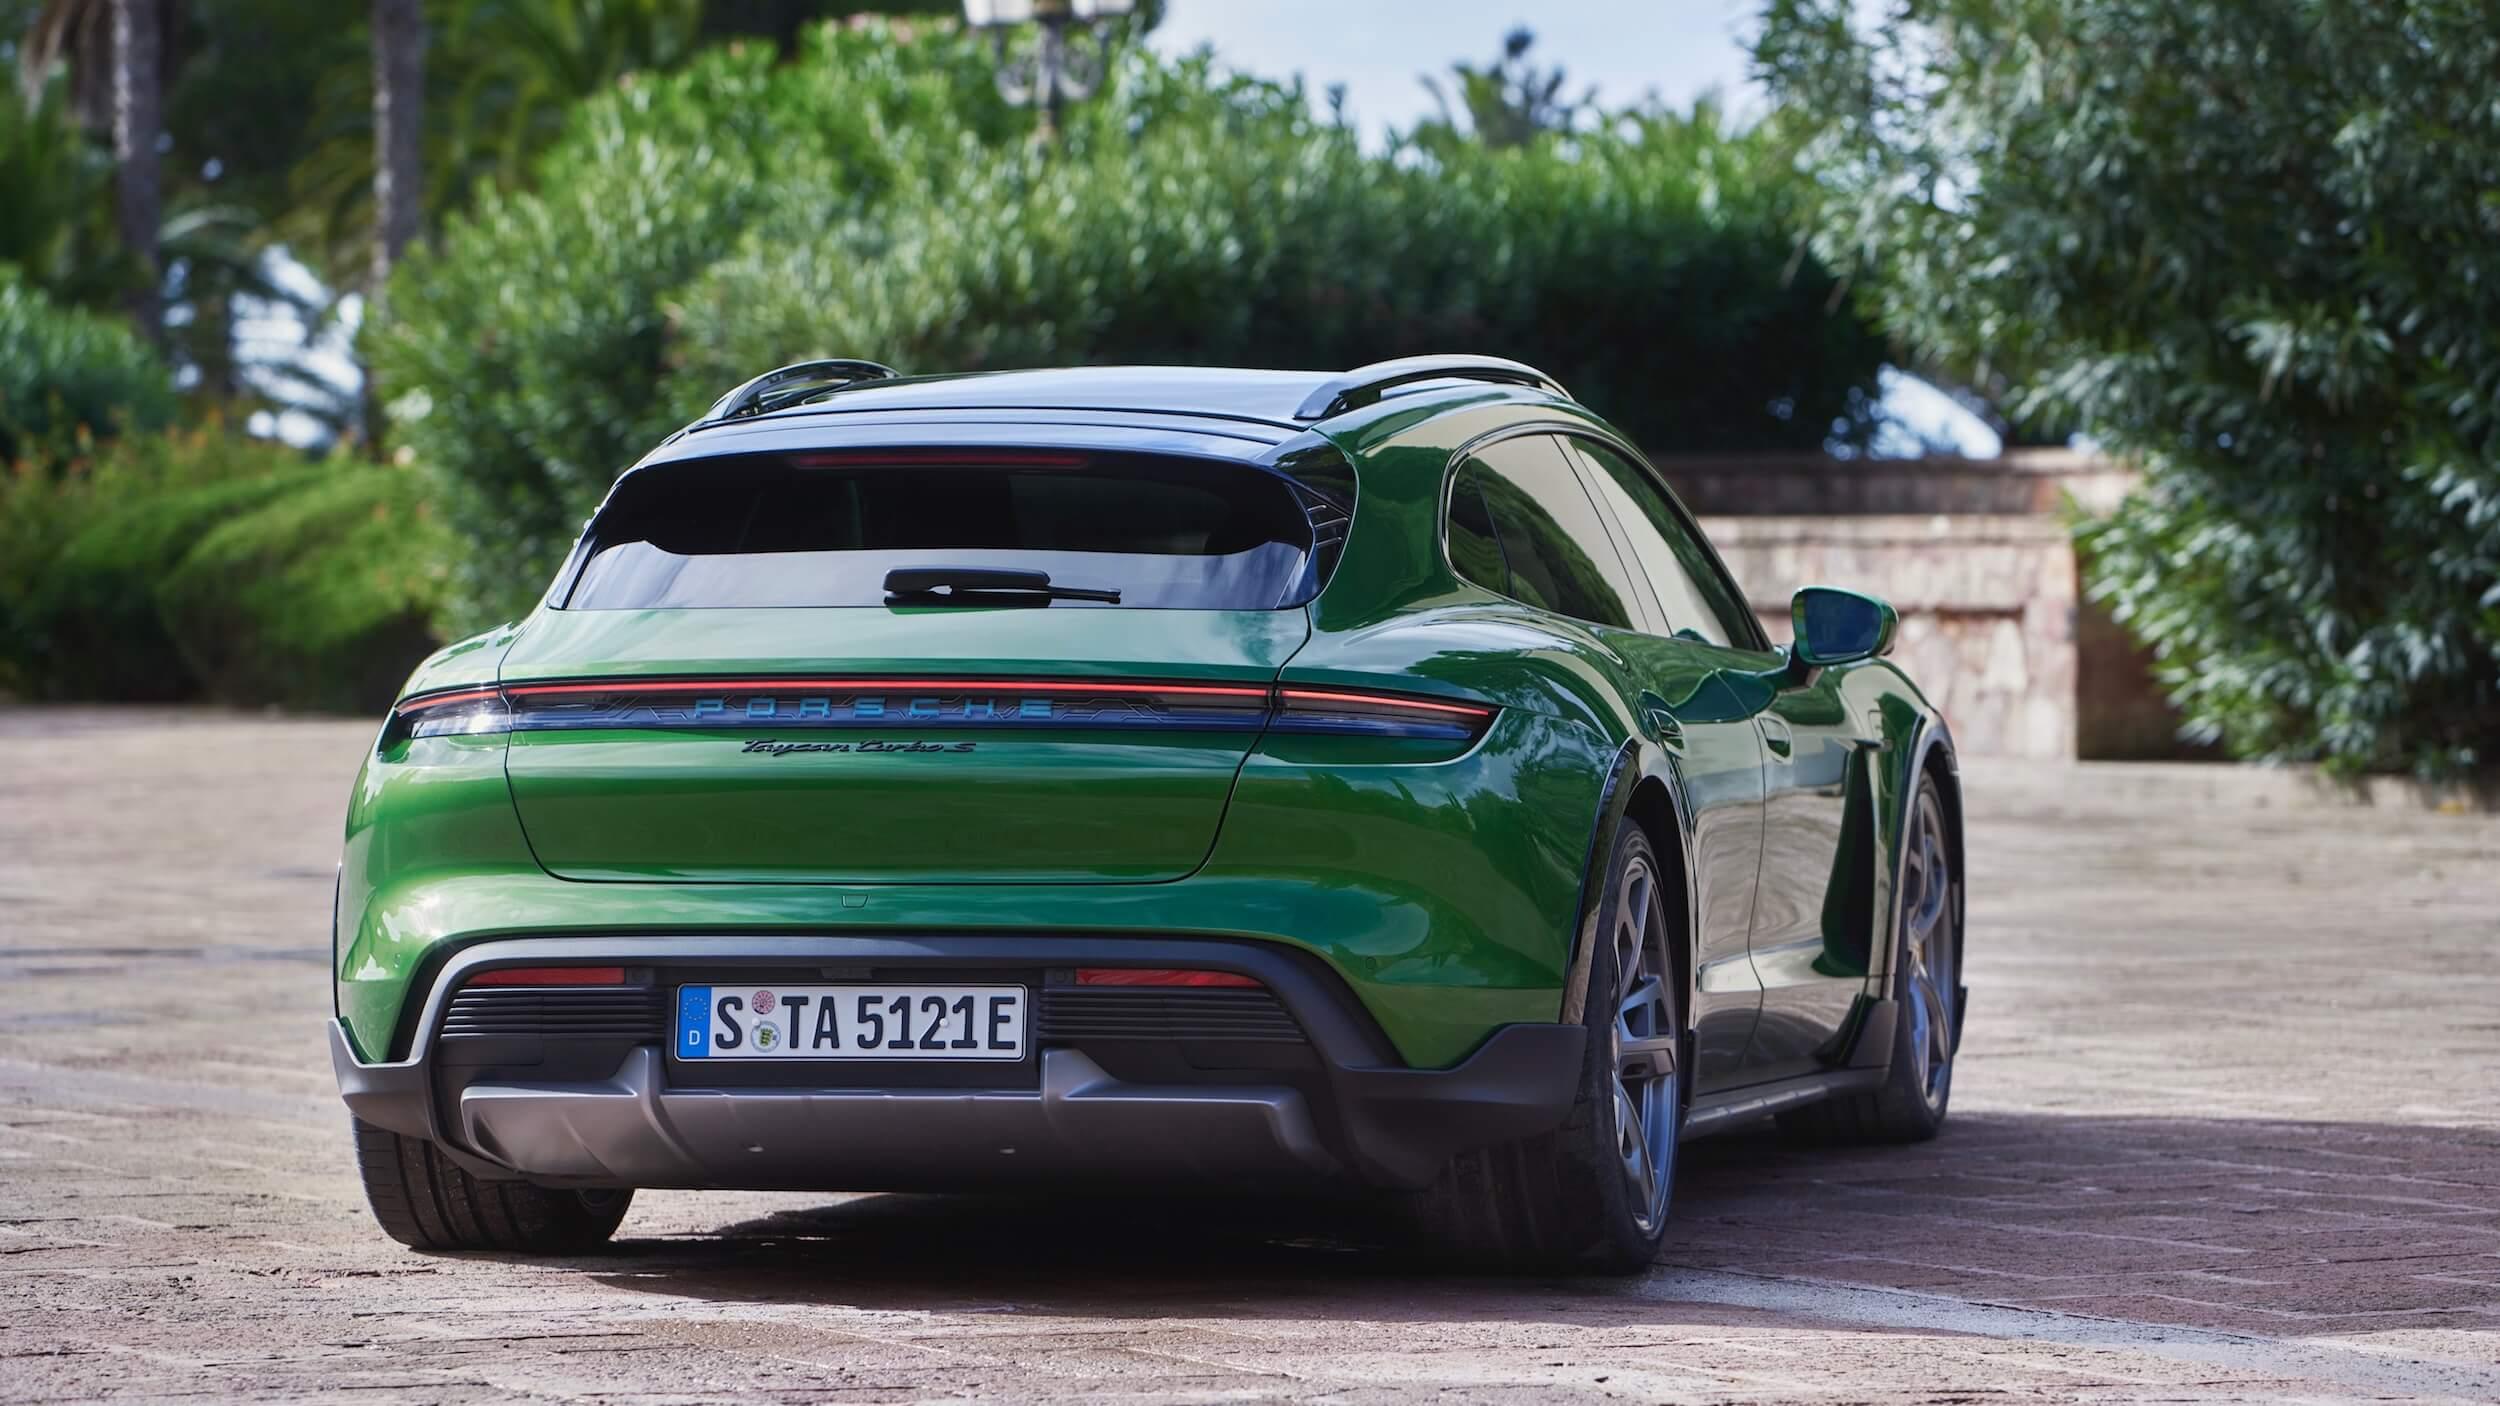 Porsche Taycan S Cross Turismo